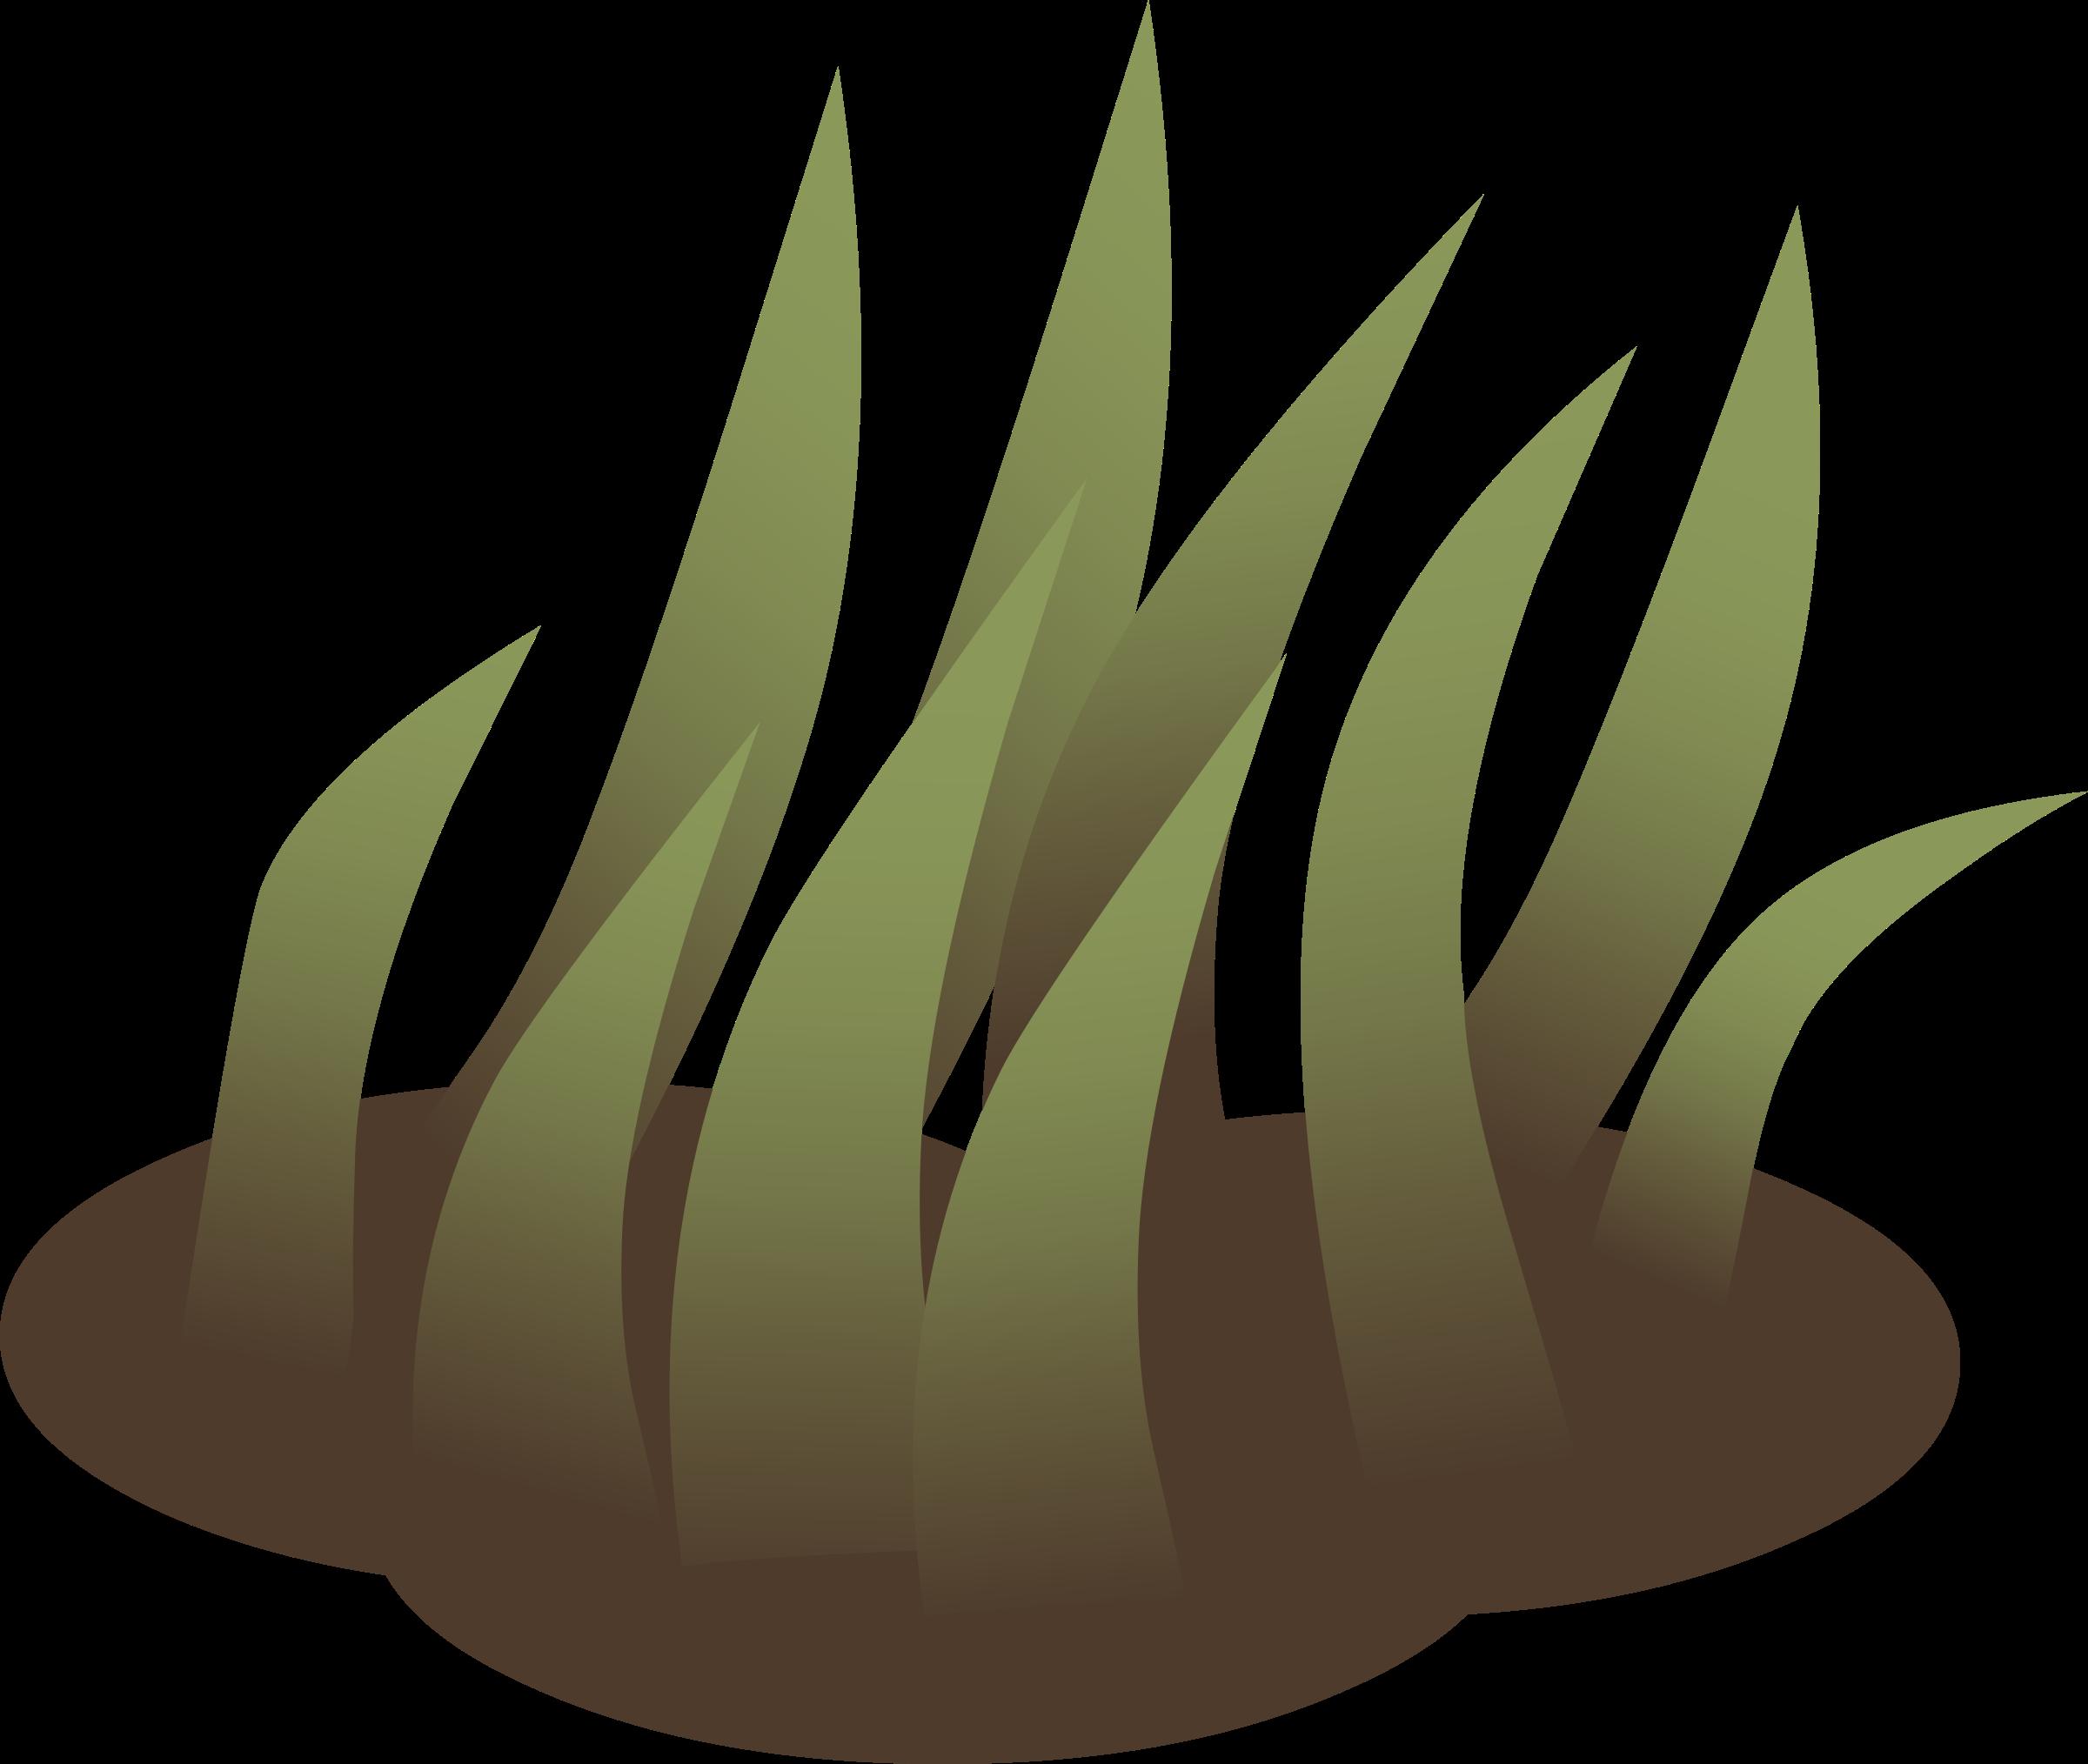 Glitch clipart gress Firebog BIG IMAGE Grass (PNG)